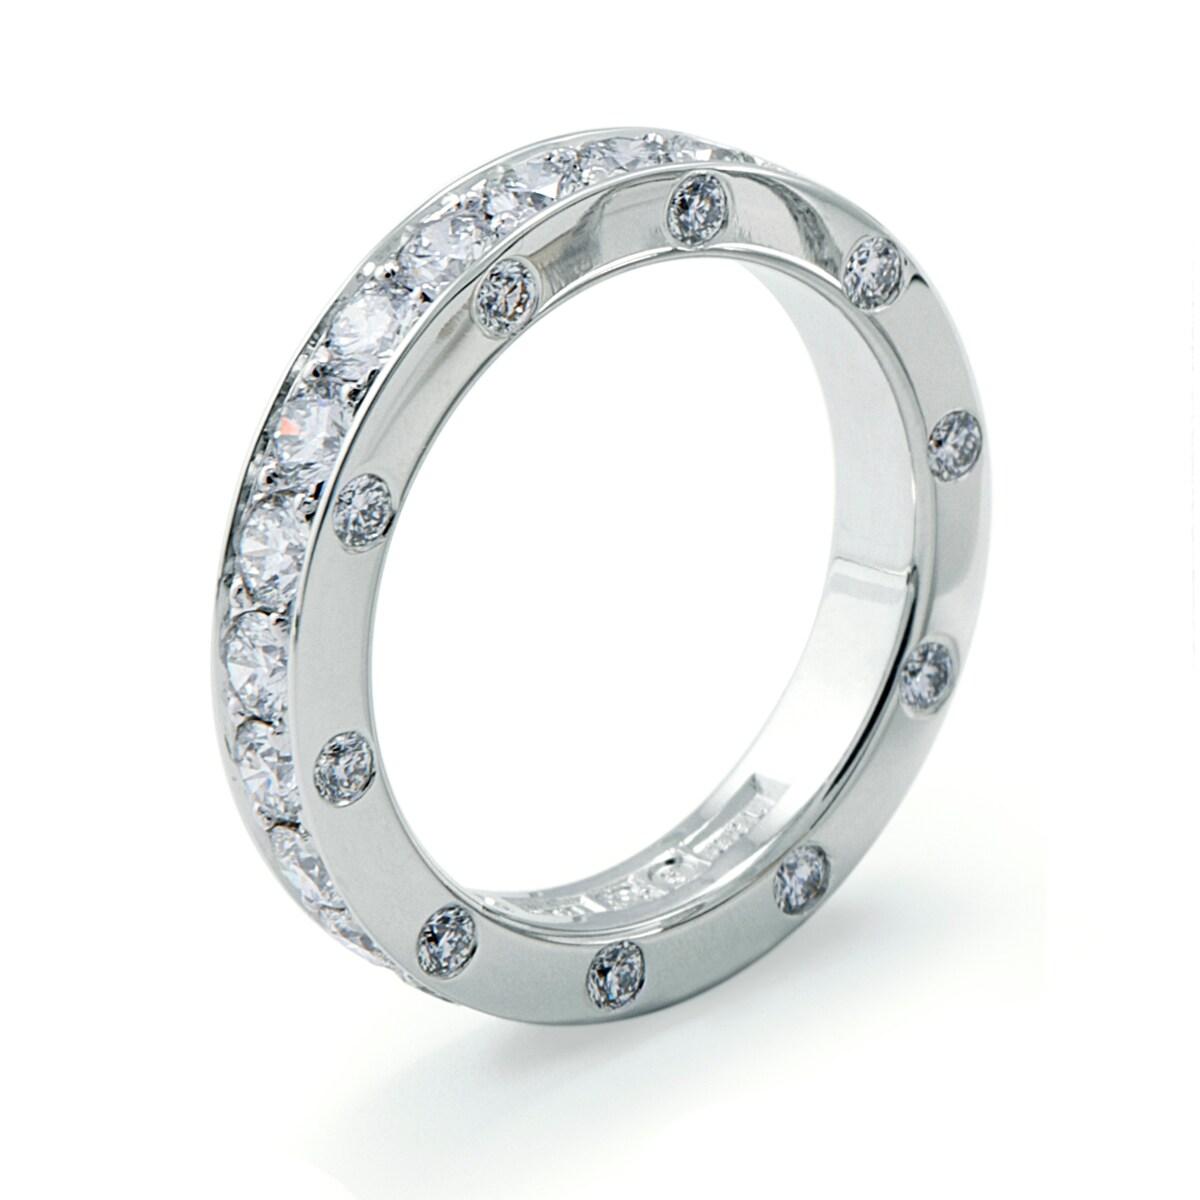 Jarl Sandin Design Diamantring Vigselring Plain Allians 3 hos Jarl Sandin f50657df1cab1